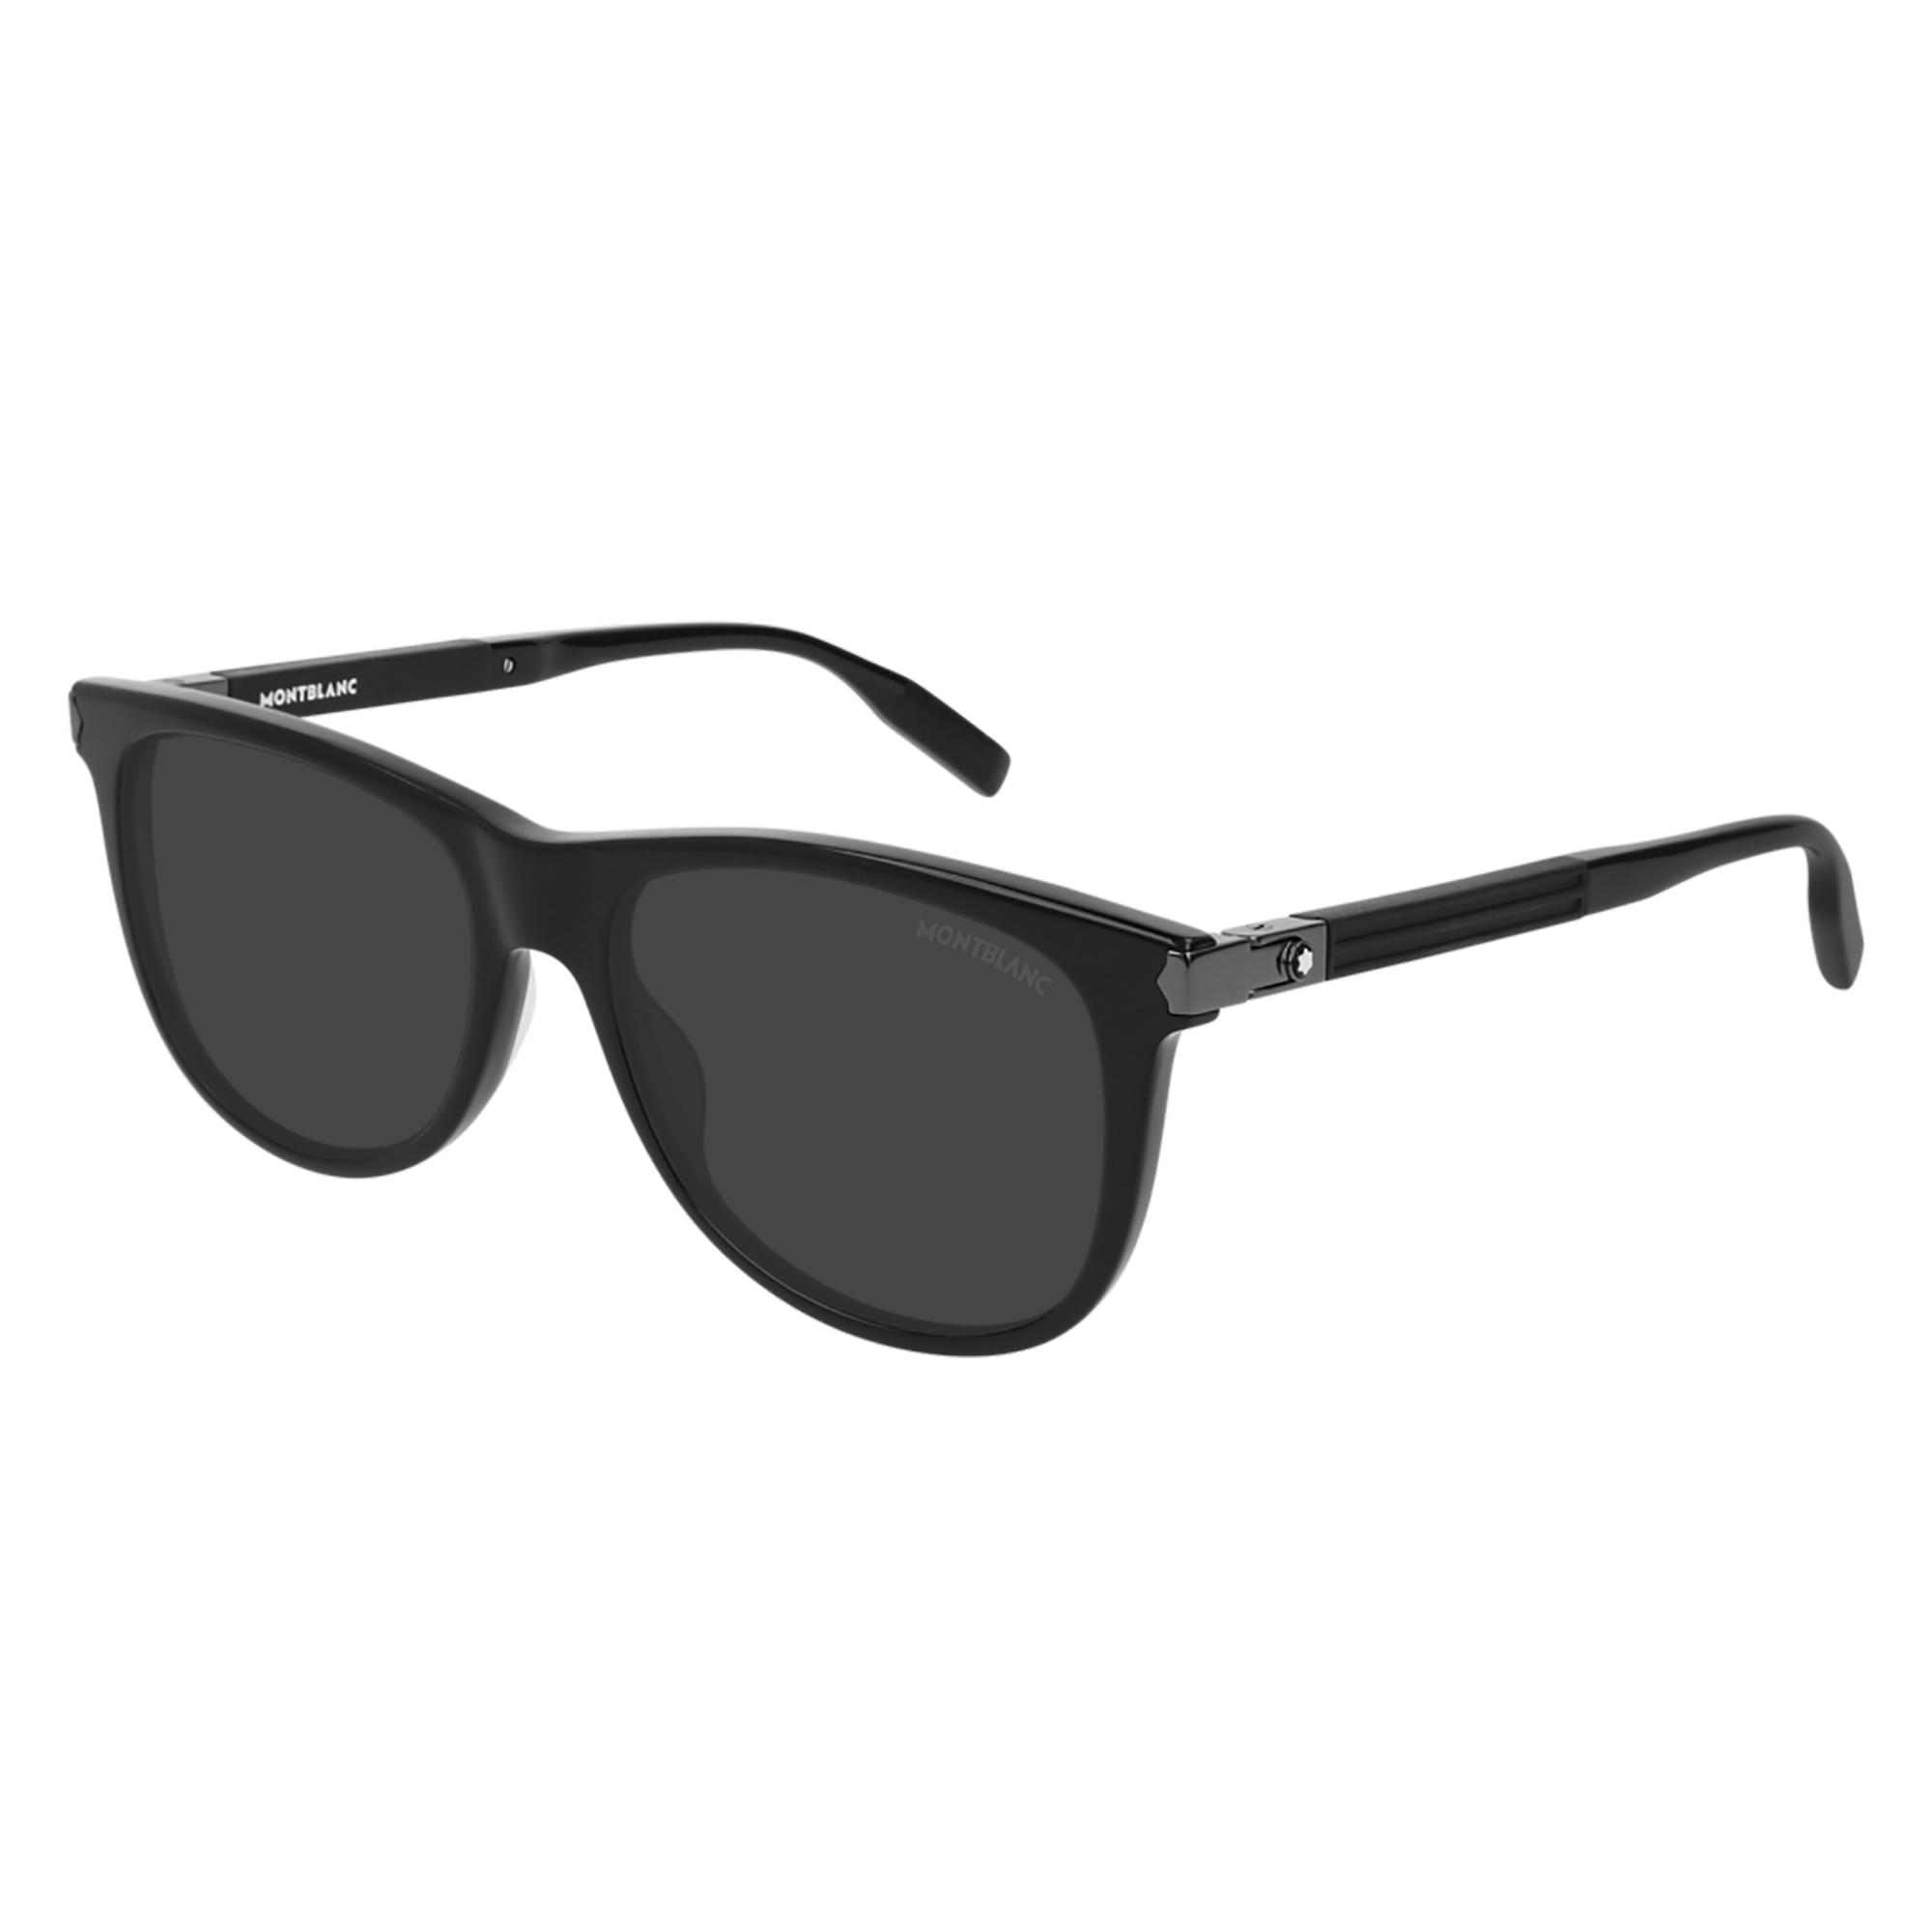 010 black black grey